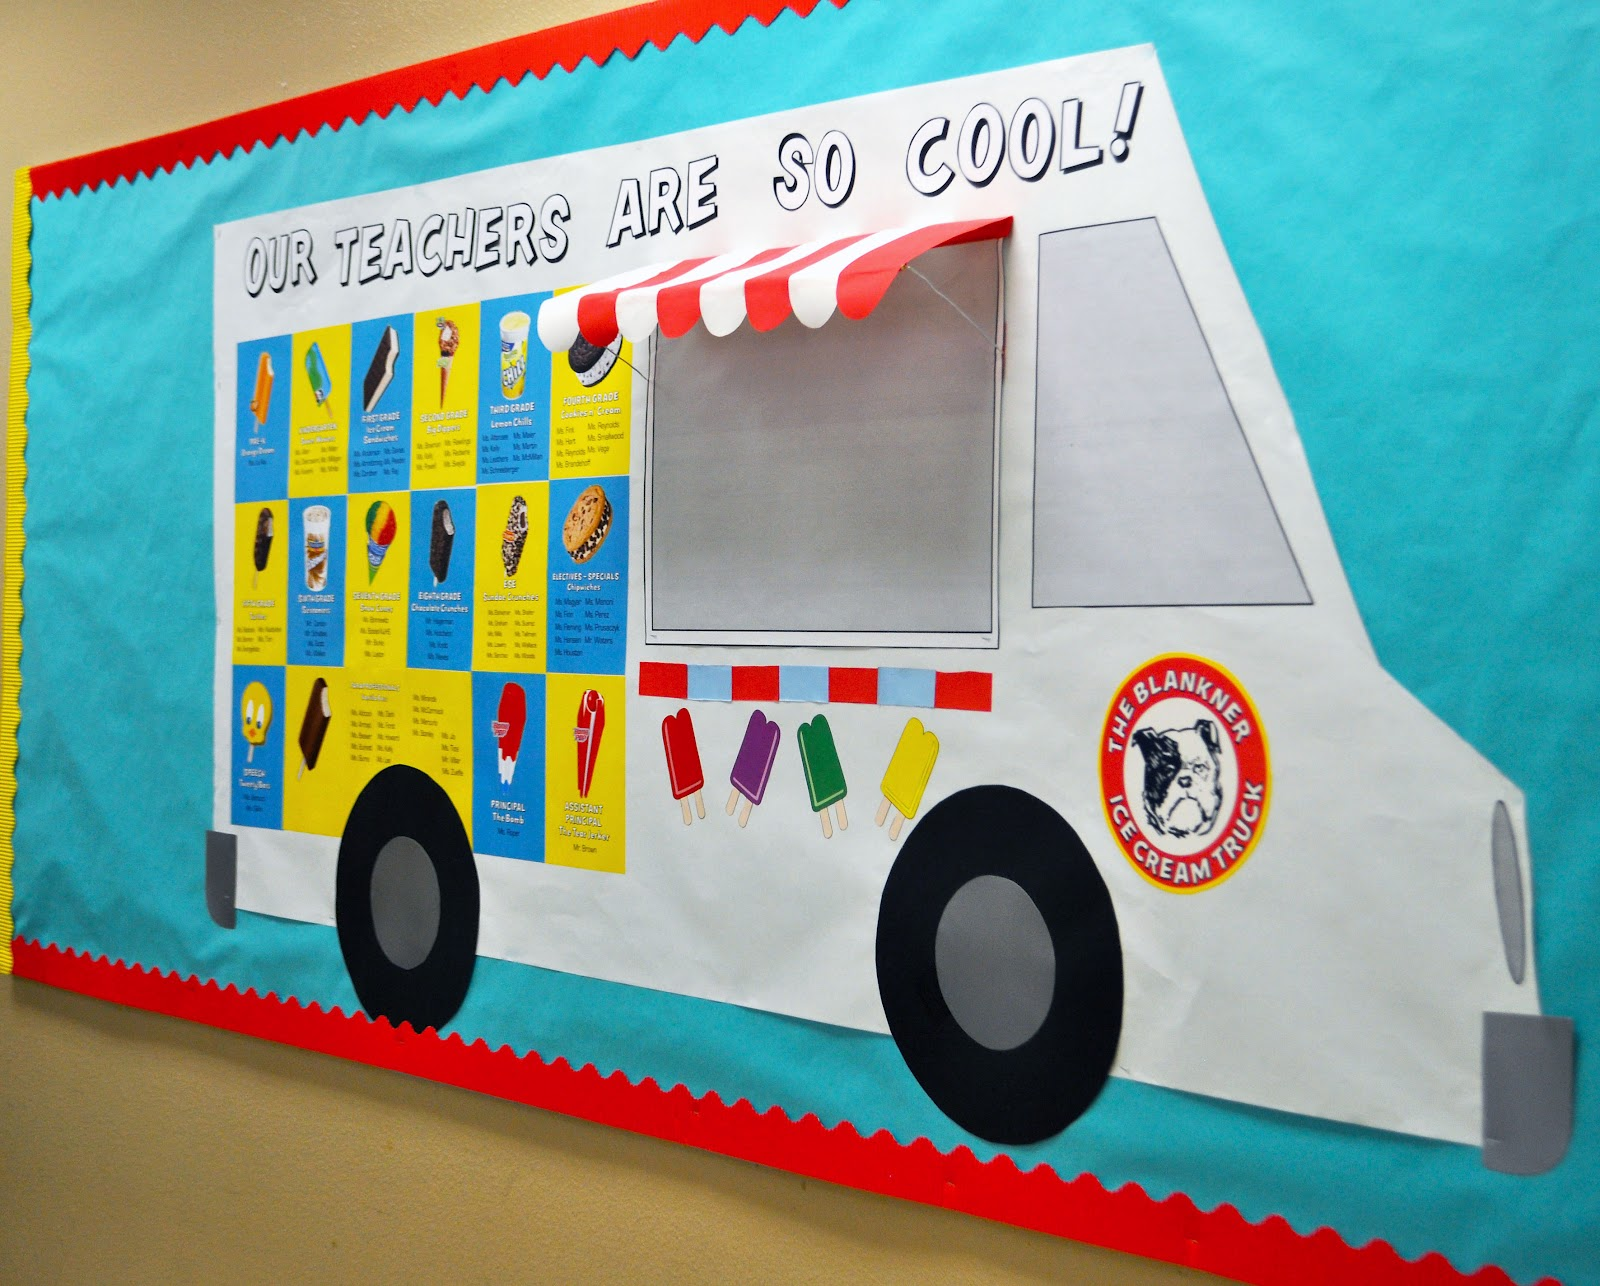 Classroom Ideas For Teachers ~ Ewe hooo teacher appreciation week— our teachers are so